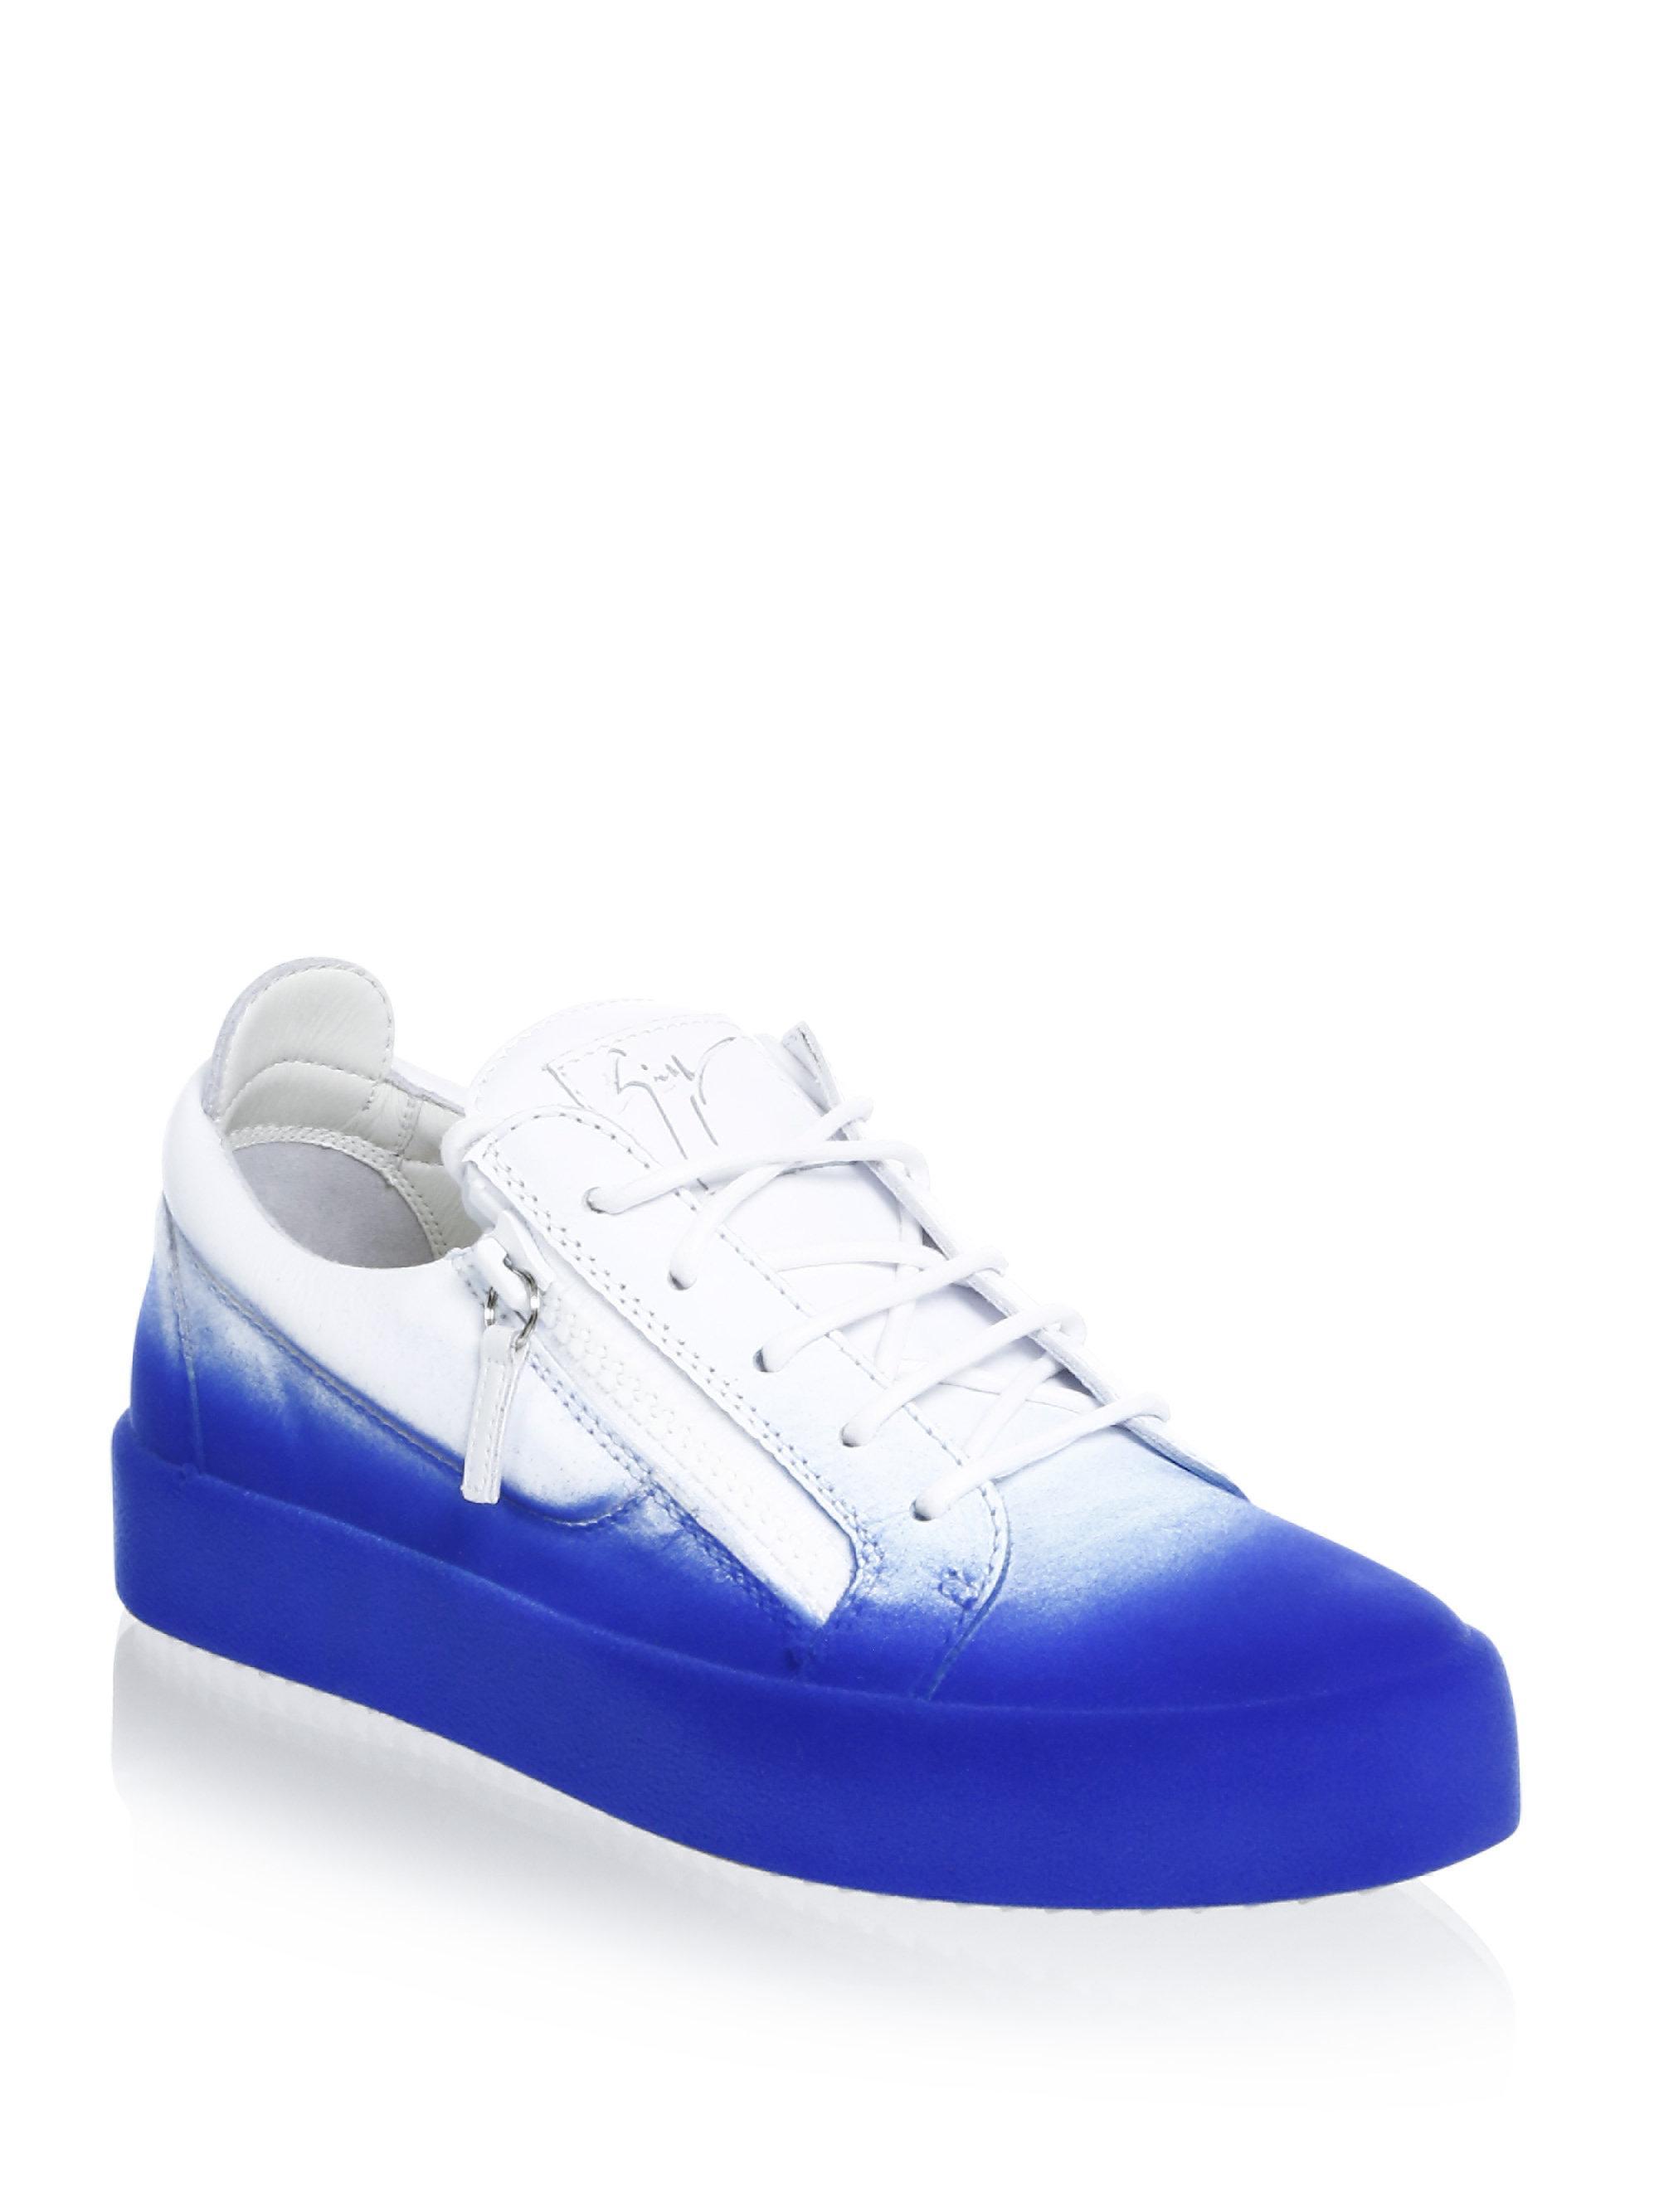 Two Tone Sneakers in White Leather Giuseppe Zanotti zznUPi